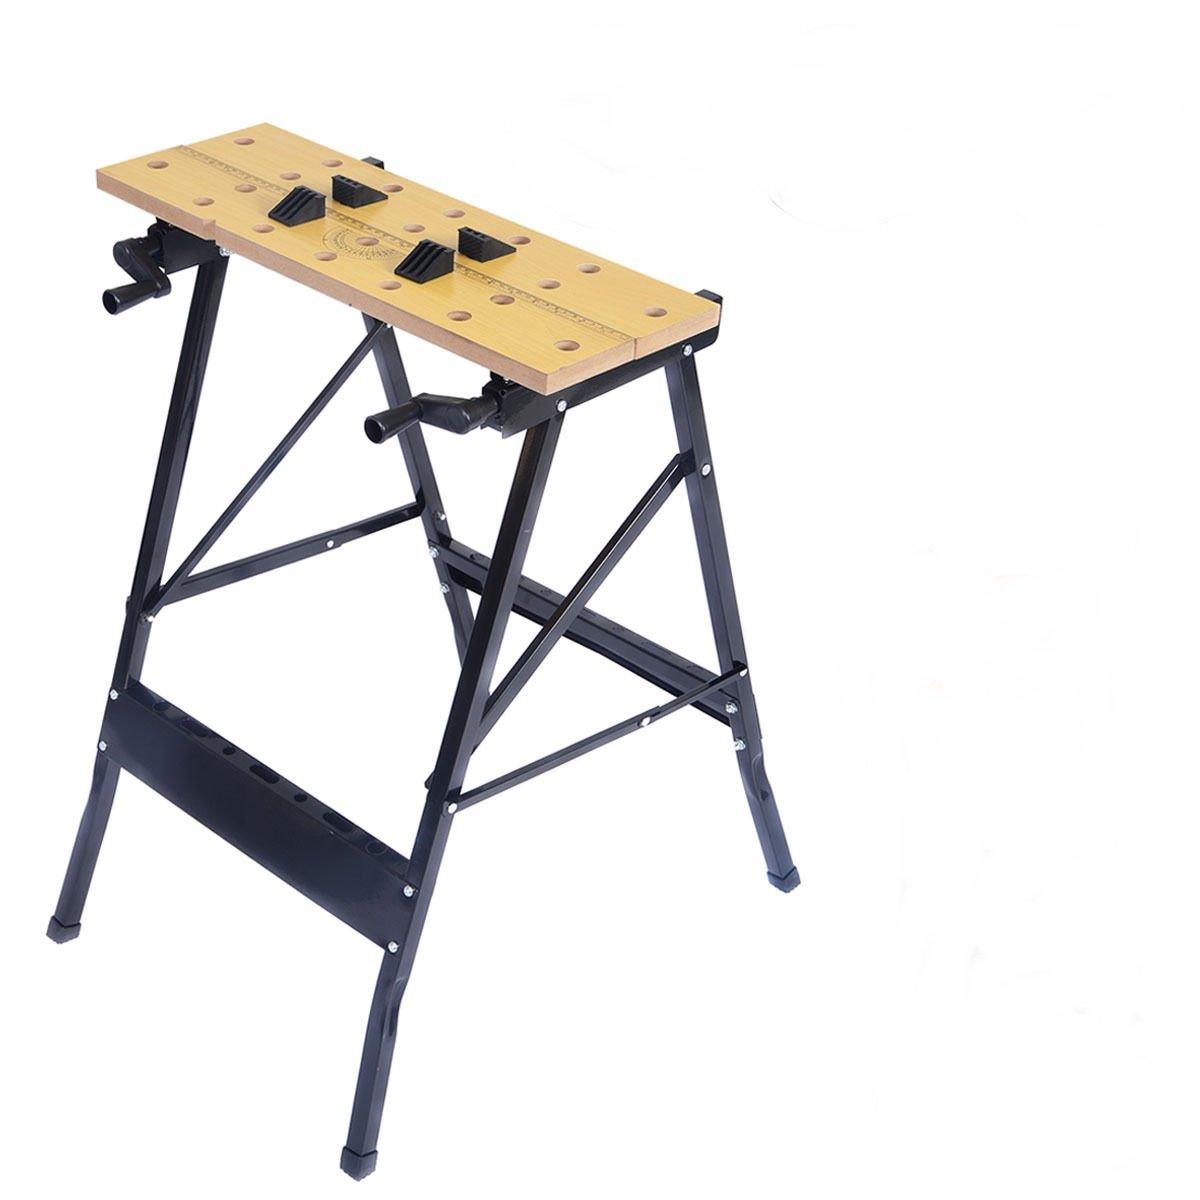 Foldable Work Bench Table Tool Repair Workshop Capacity 350 Lb w/ Adjustable Swivel Pegs